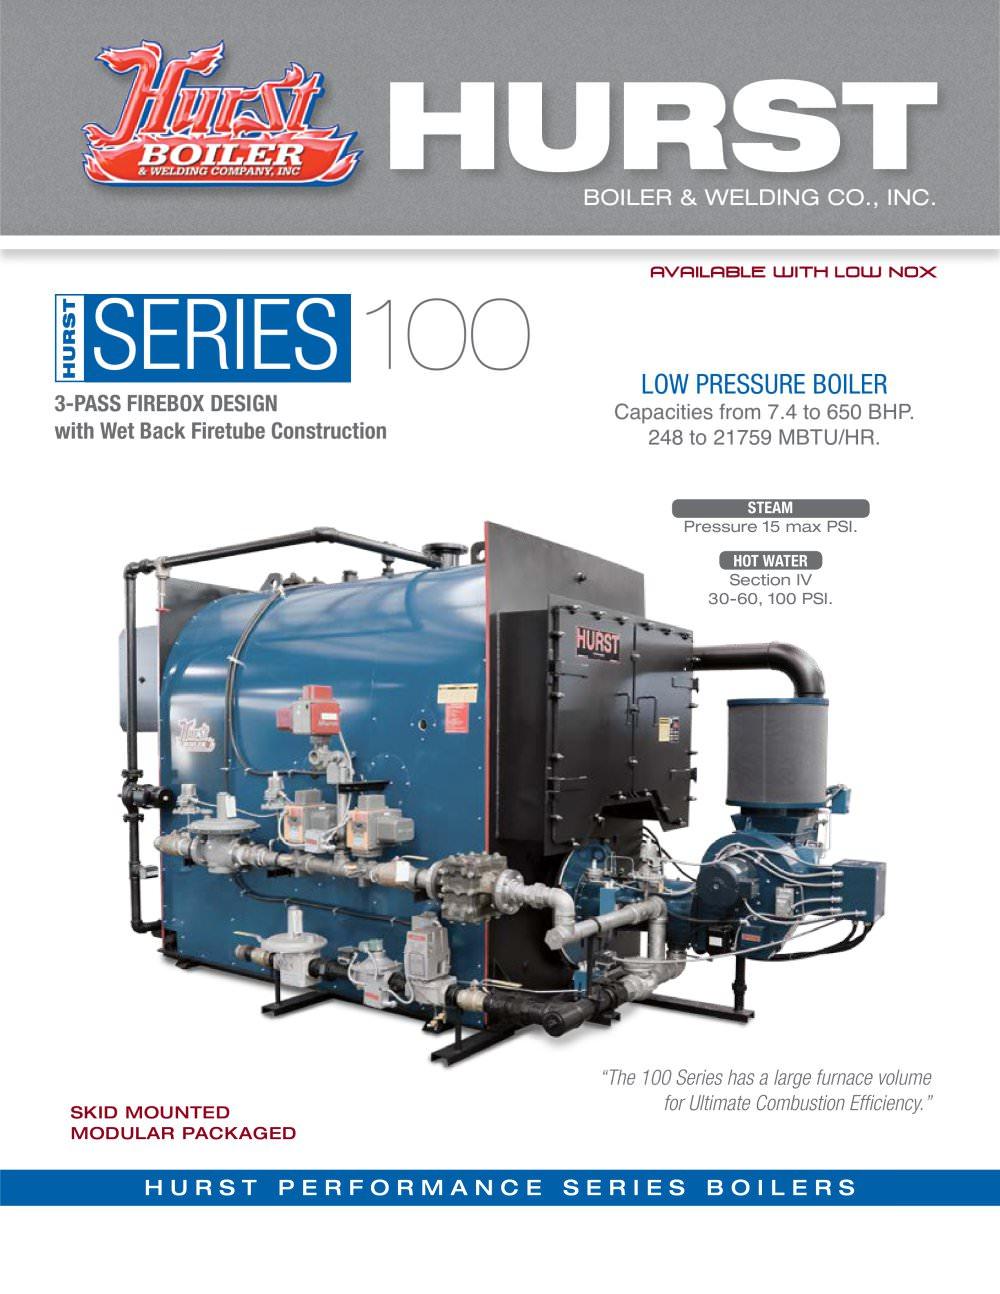 Series 100 - Hurst Boiler & Welding Co., Inc. - PDF Catalogues ...